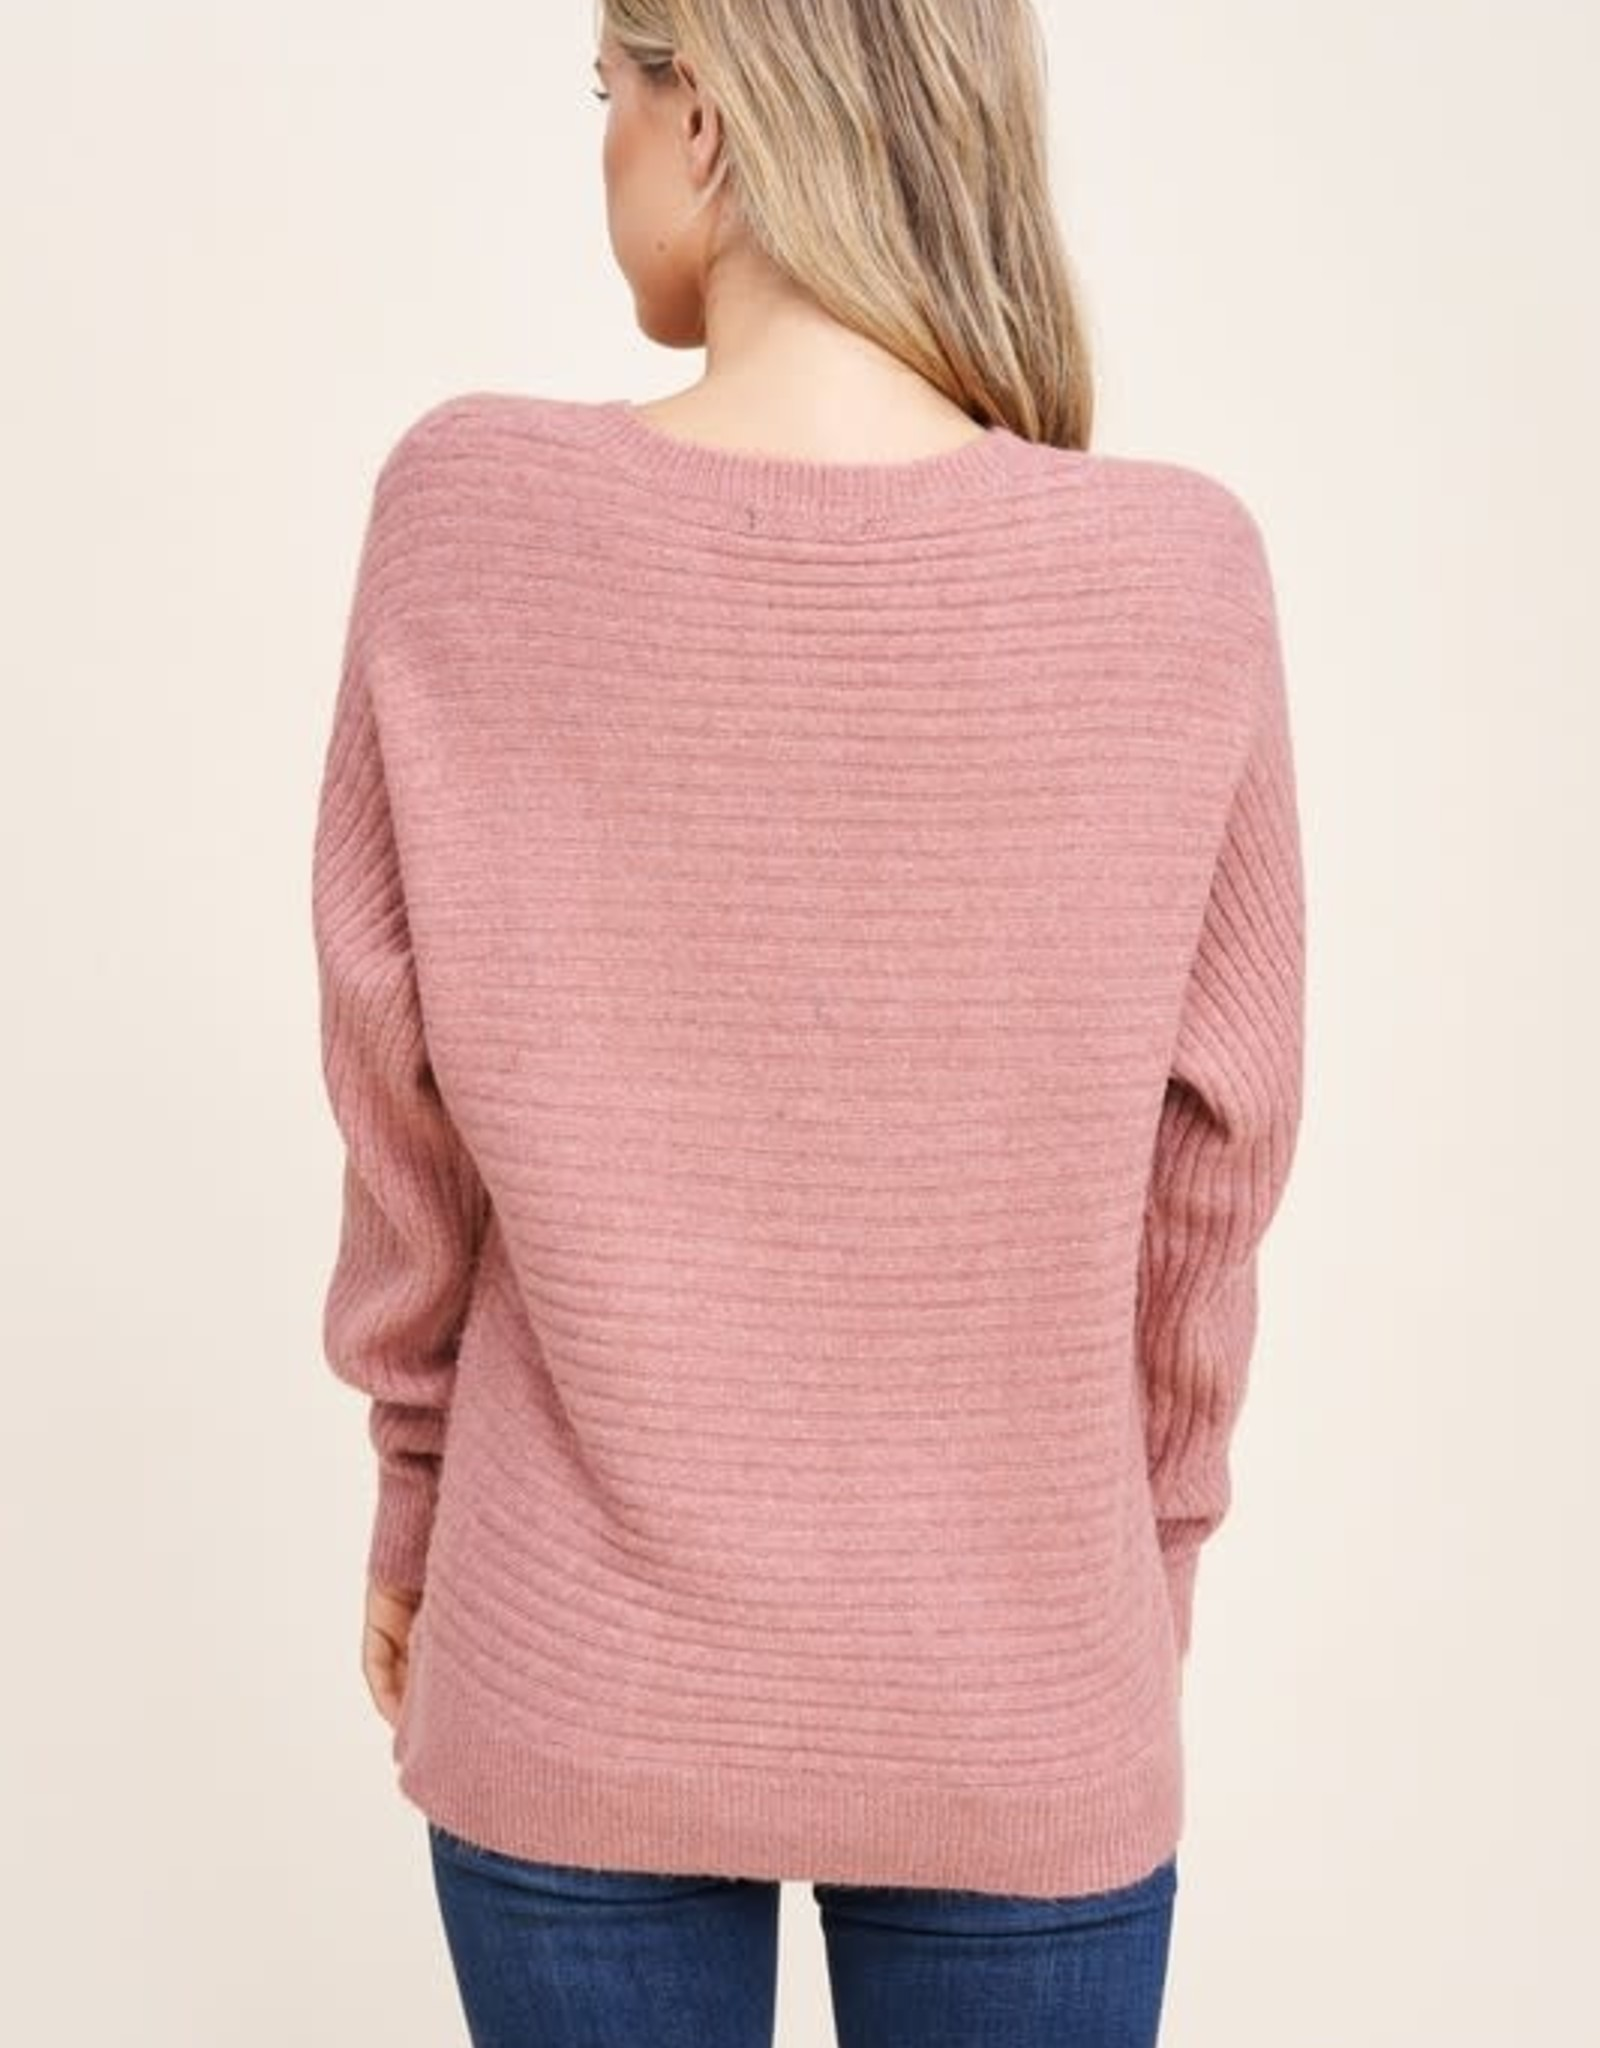 TLC 53122 crew neck ribbed sweater